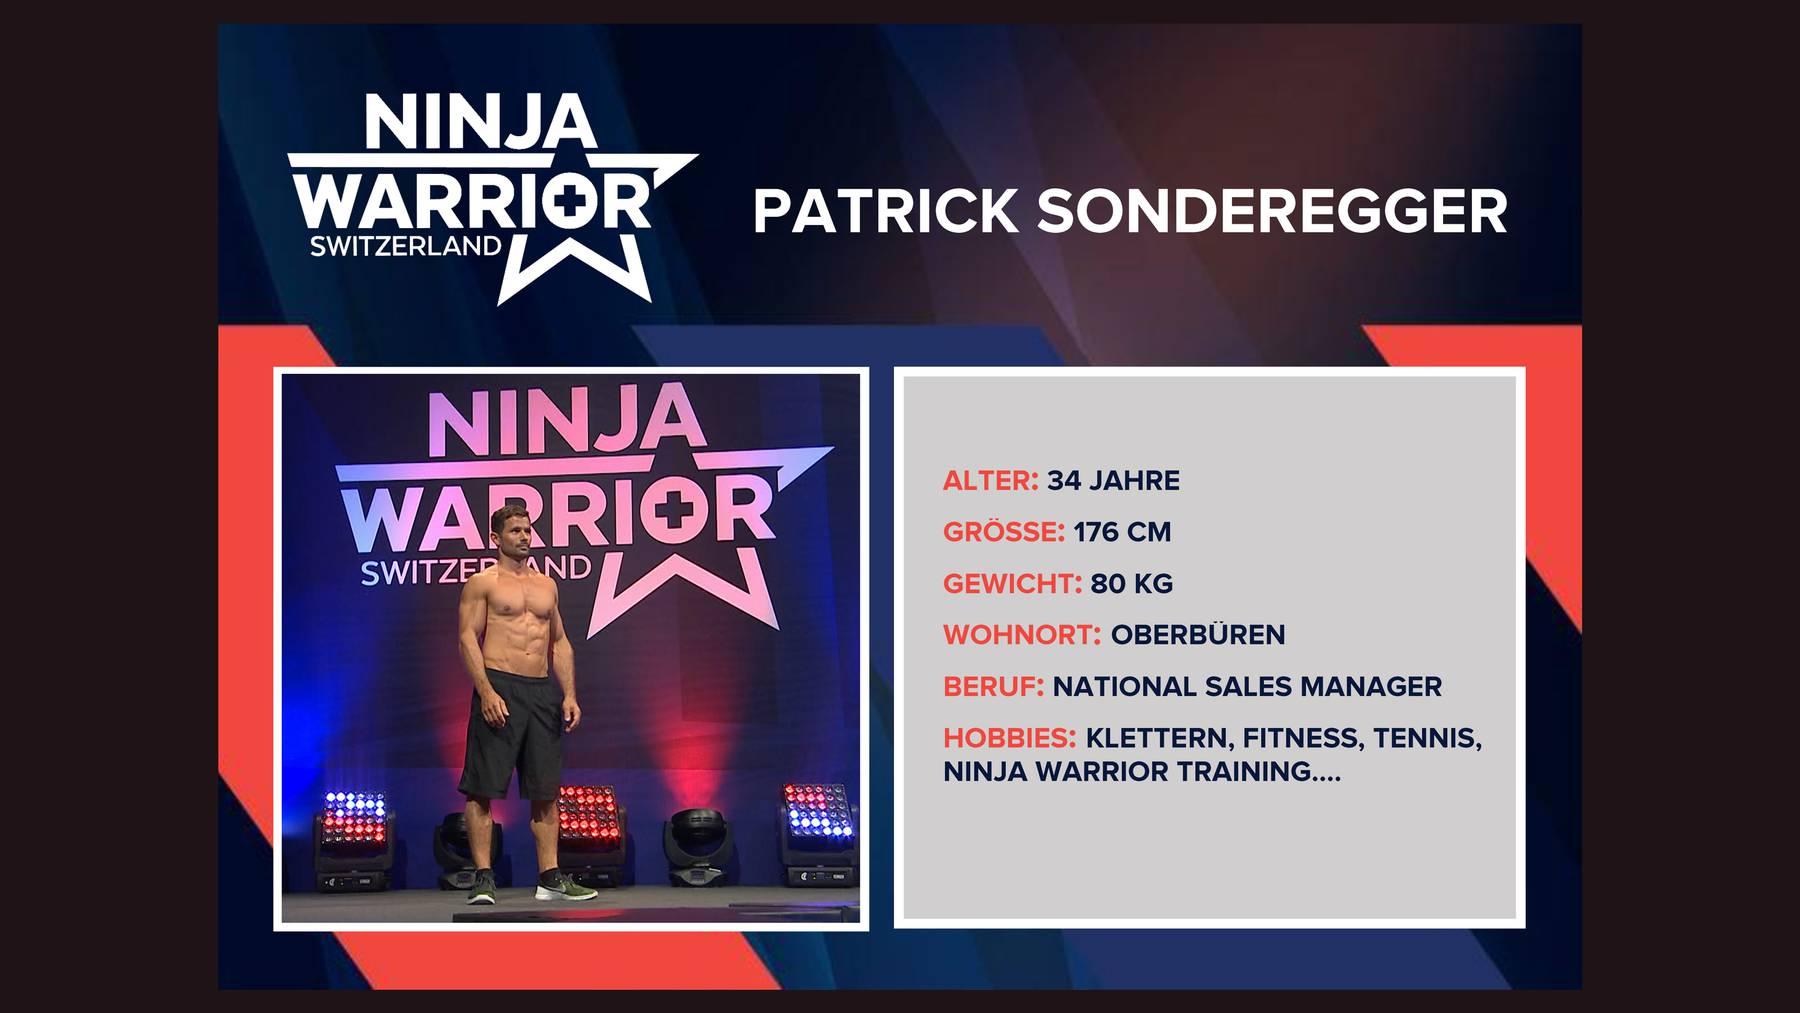 Patrick Sonderegger